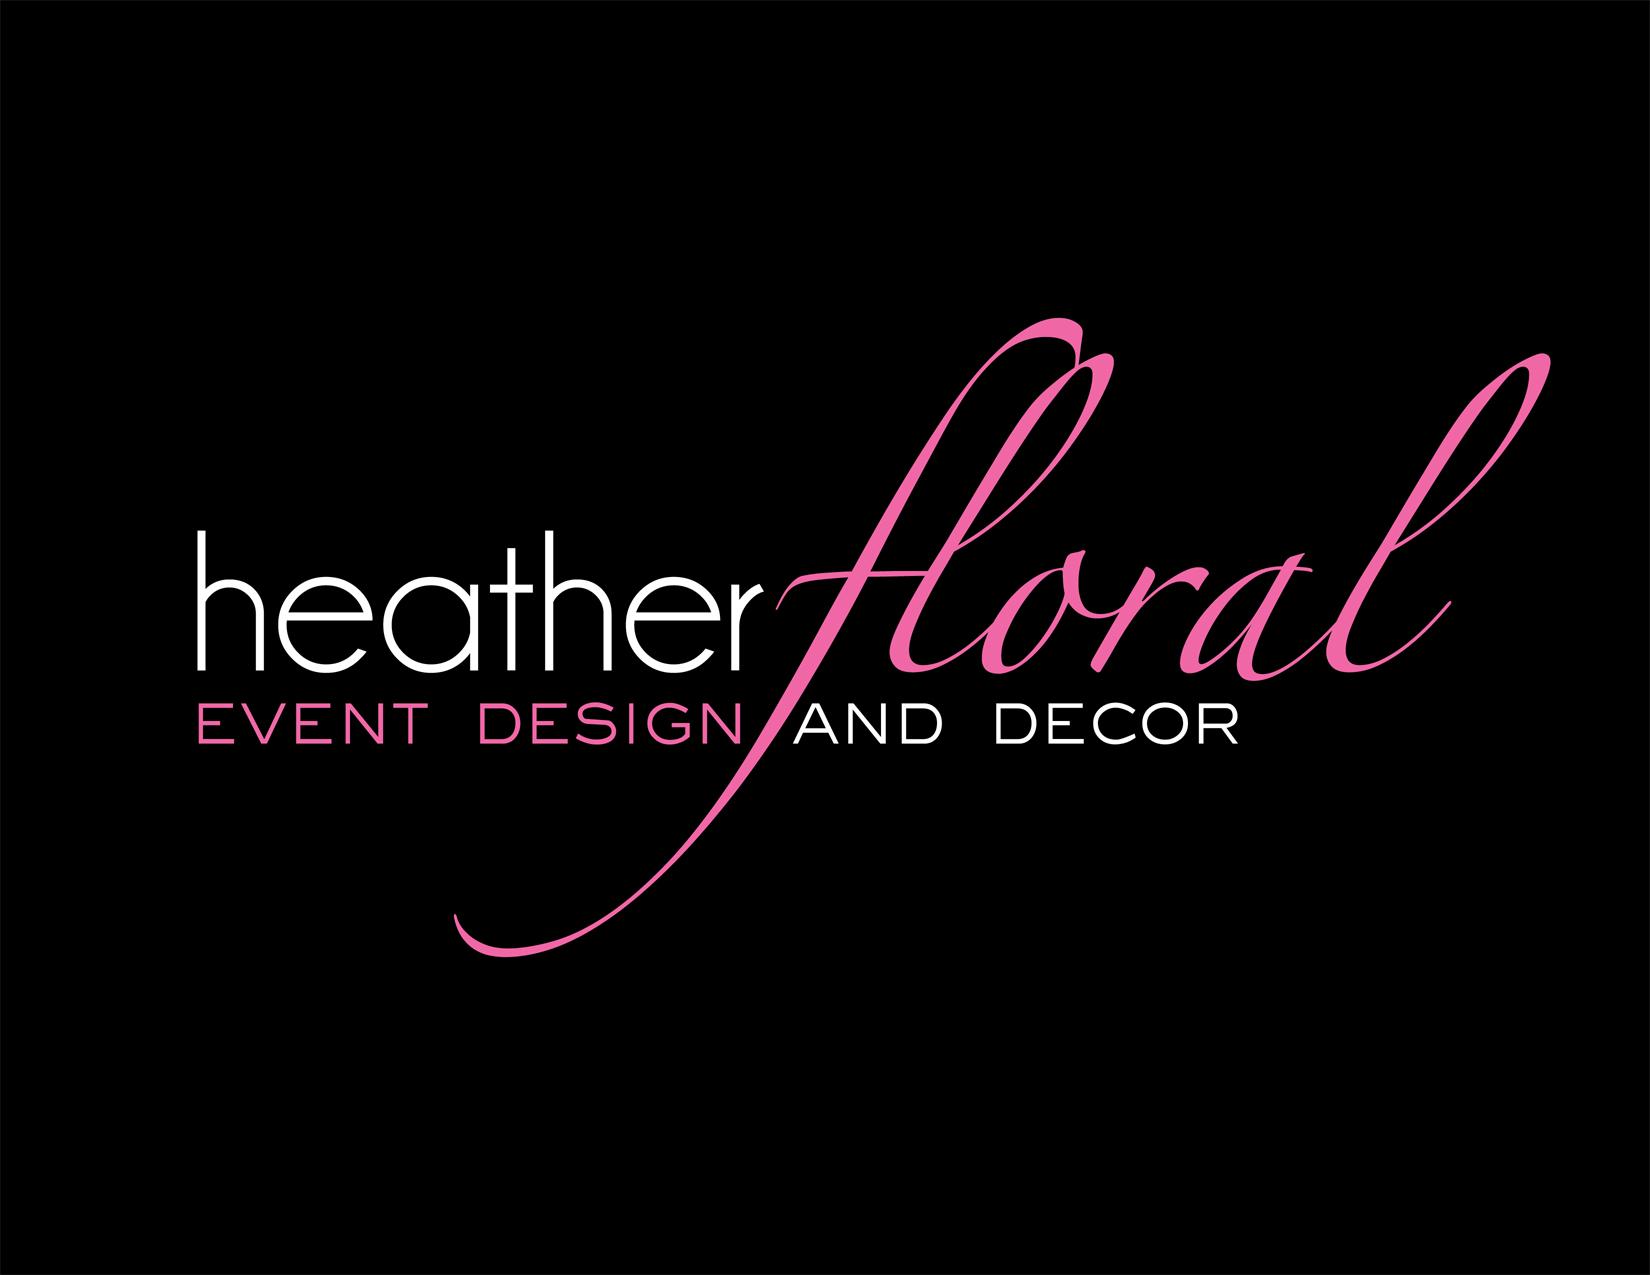 Portfolio image for Heather Floral